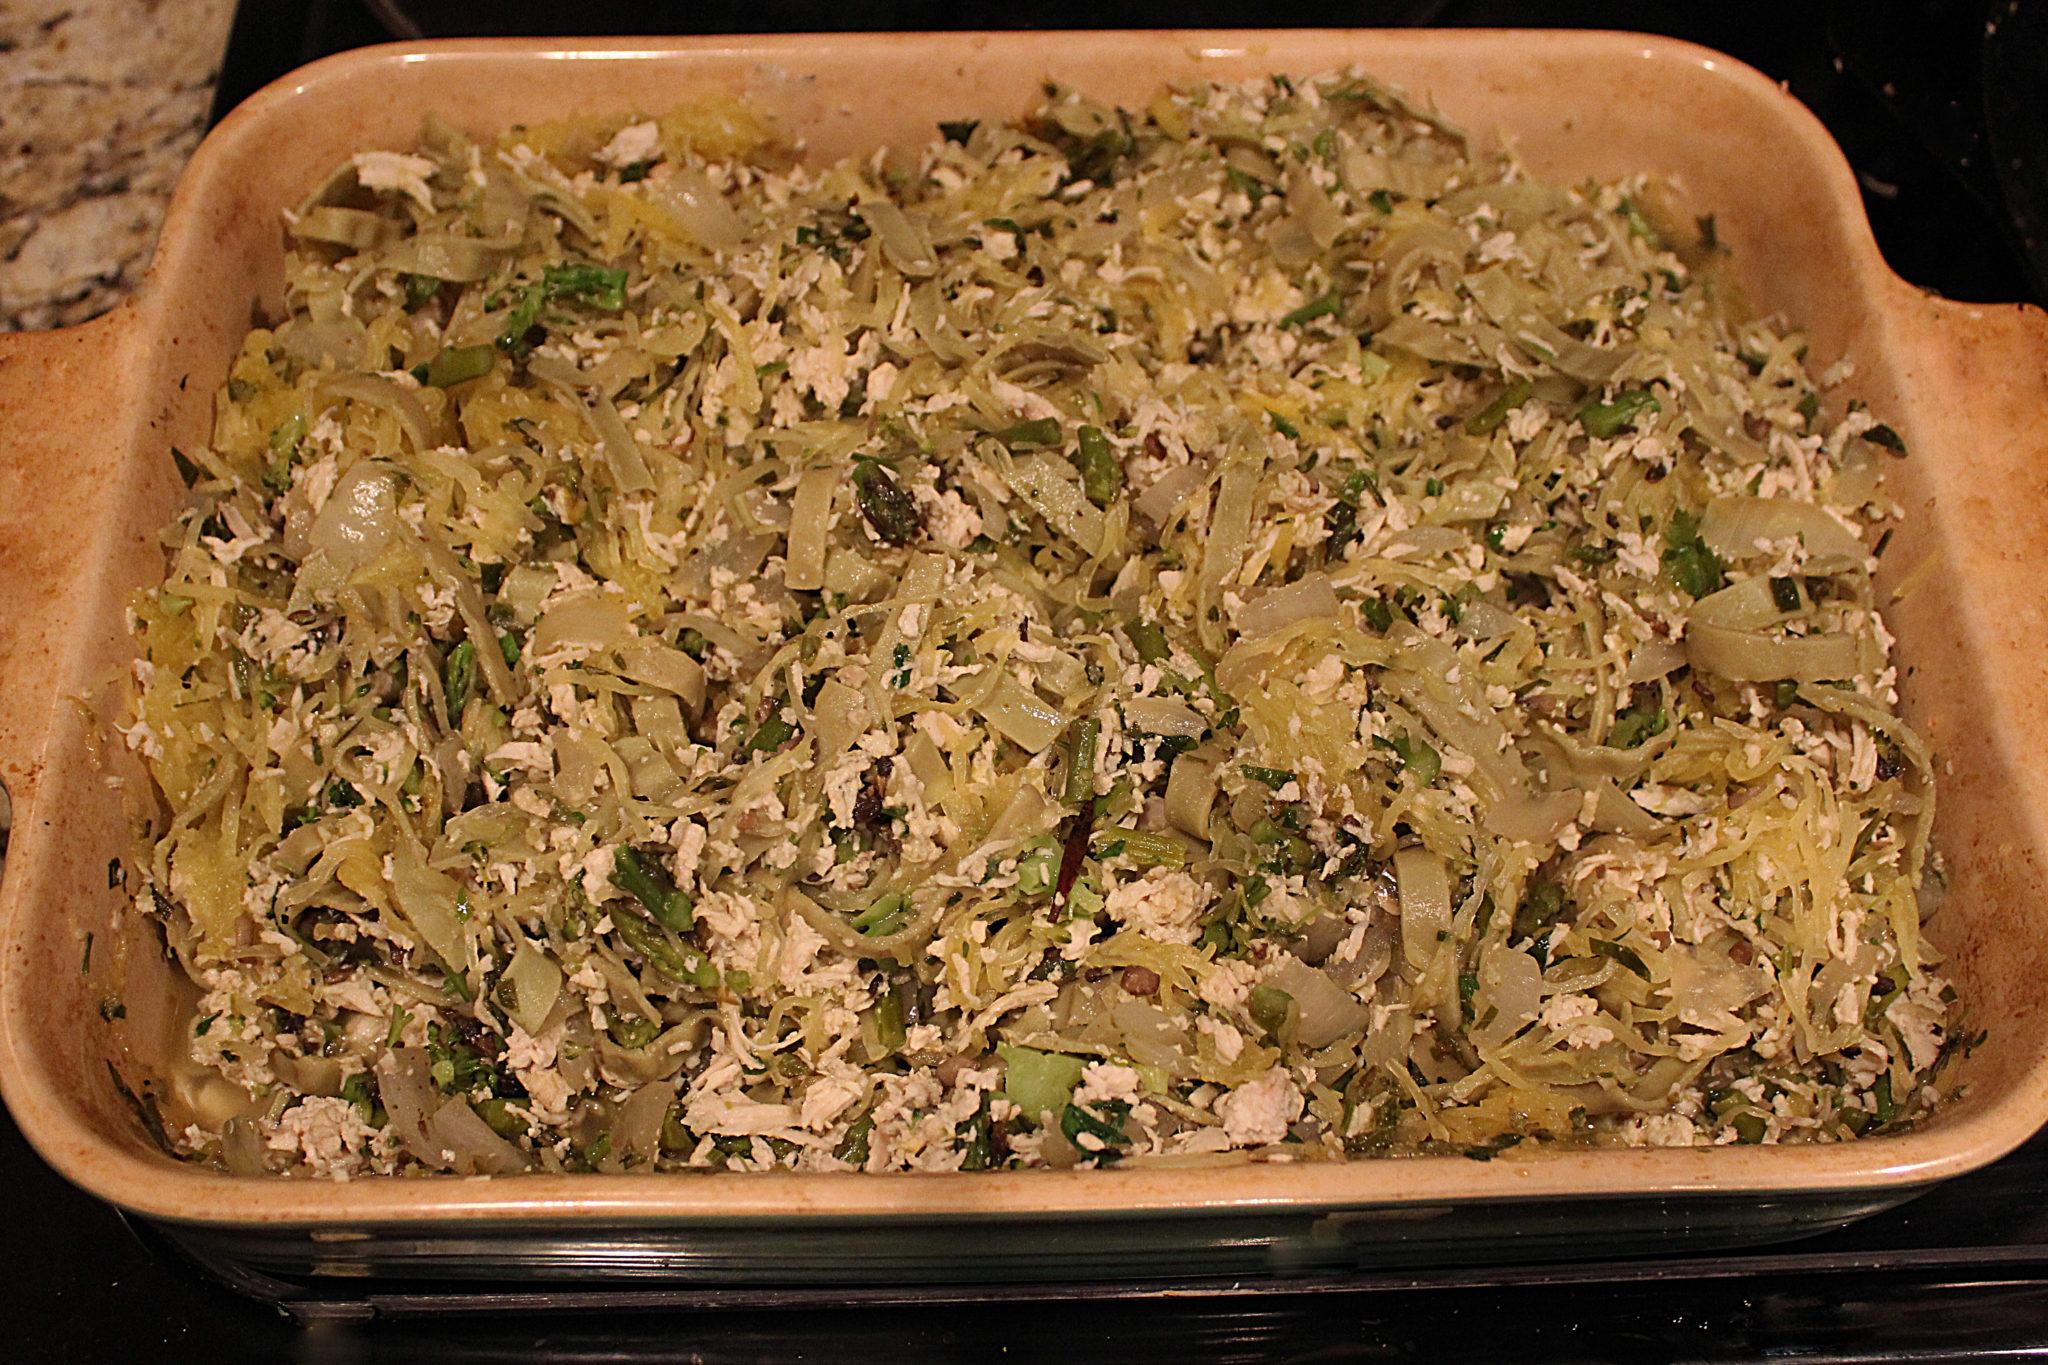 Recipe: Roasted Spaghetti Squash with Herbs - Healthy Eaton | Healthy ...